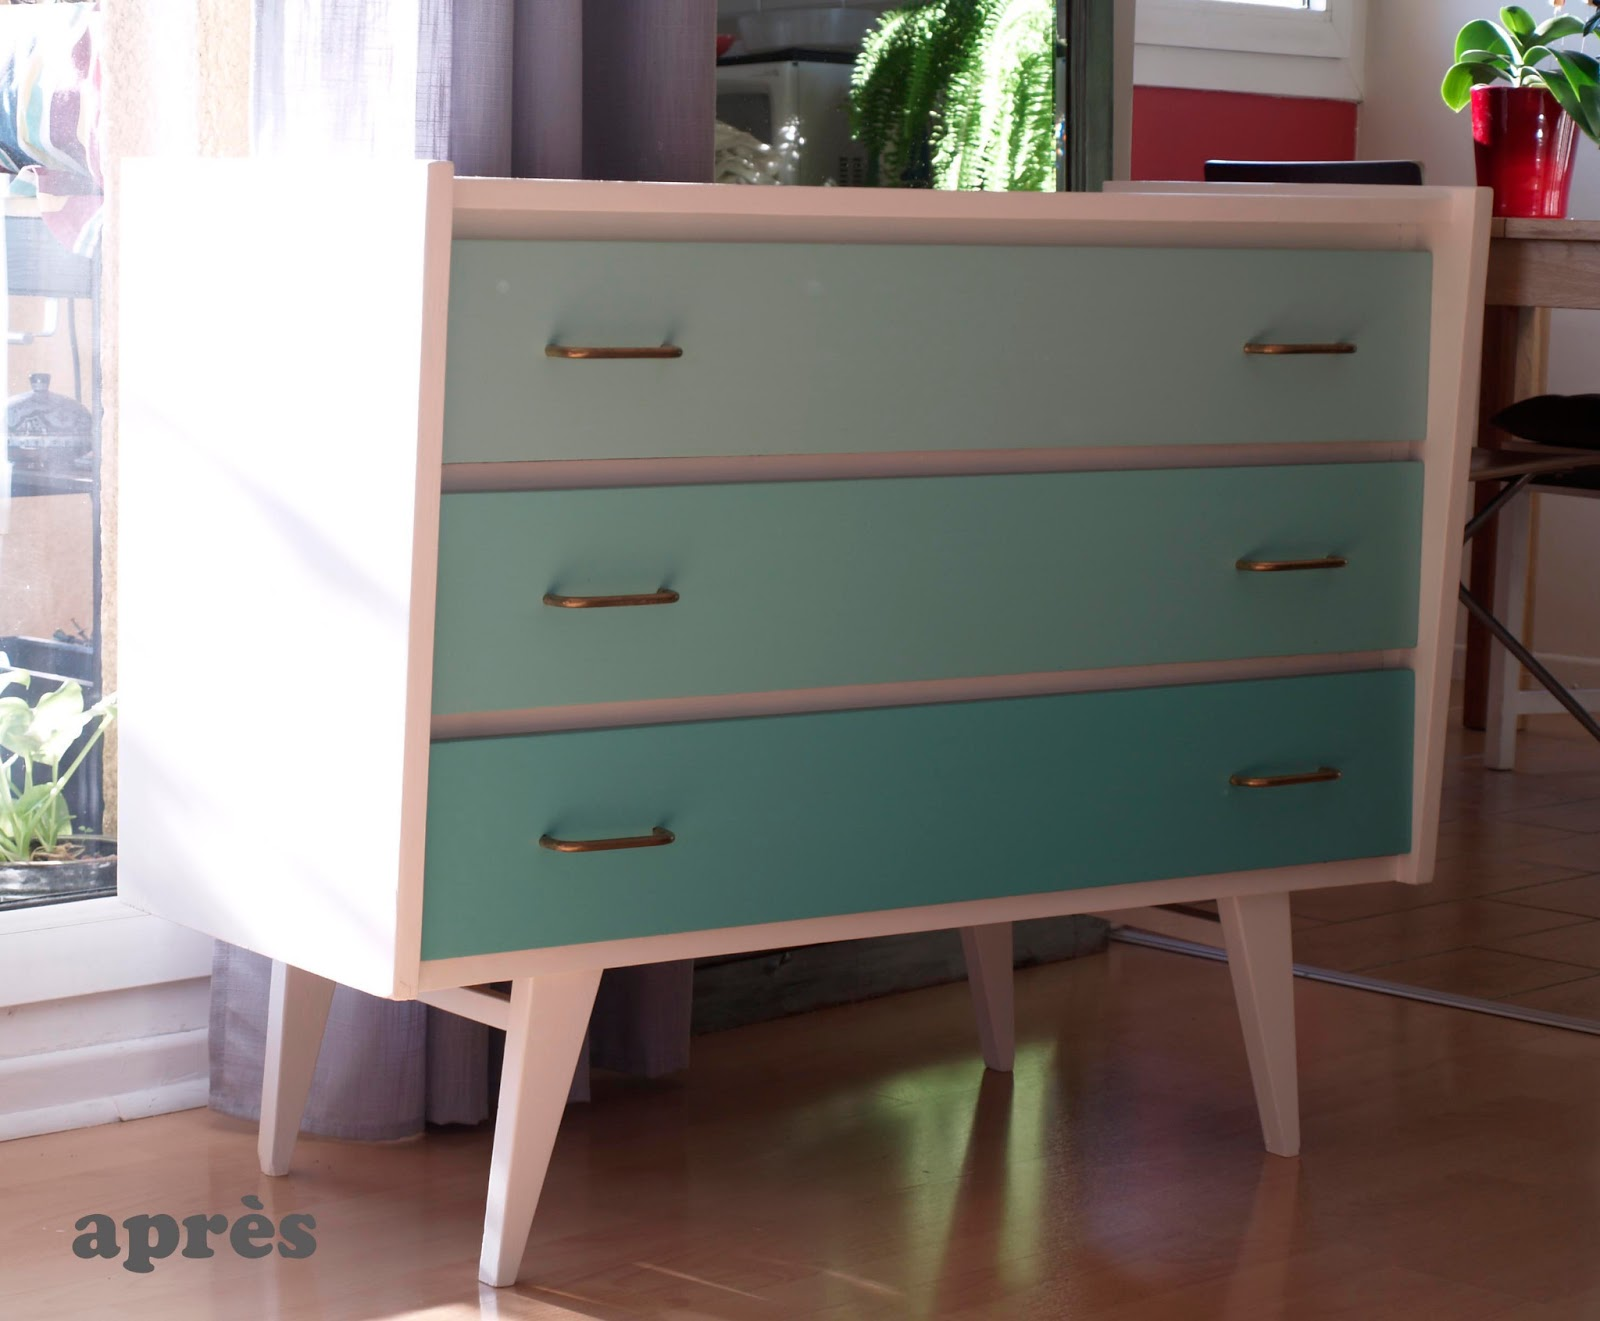 divin 39 id le blog d co avant apr s relooking commode. Black Bedroom Furniture Sets. Home Design Ideas